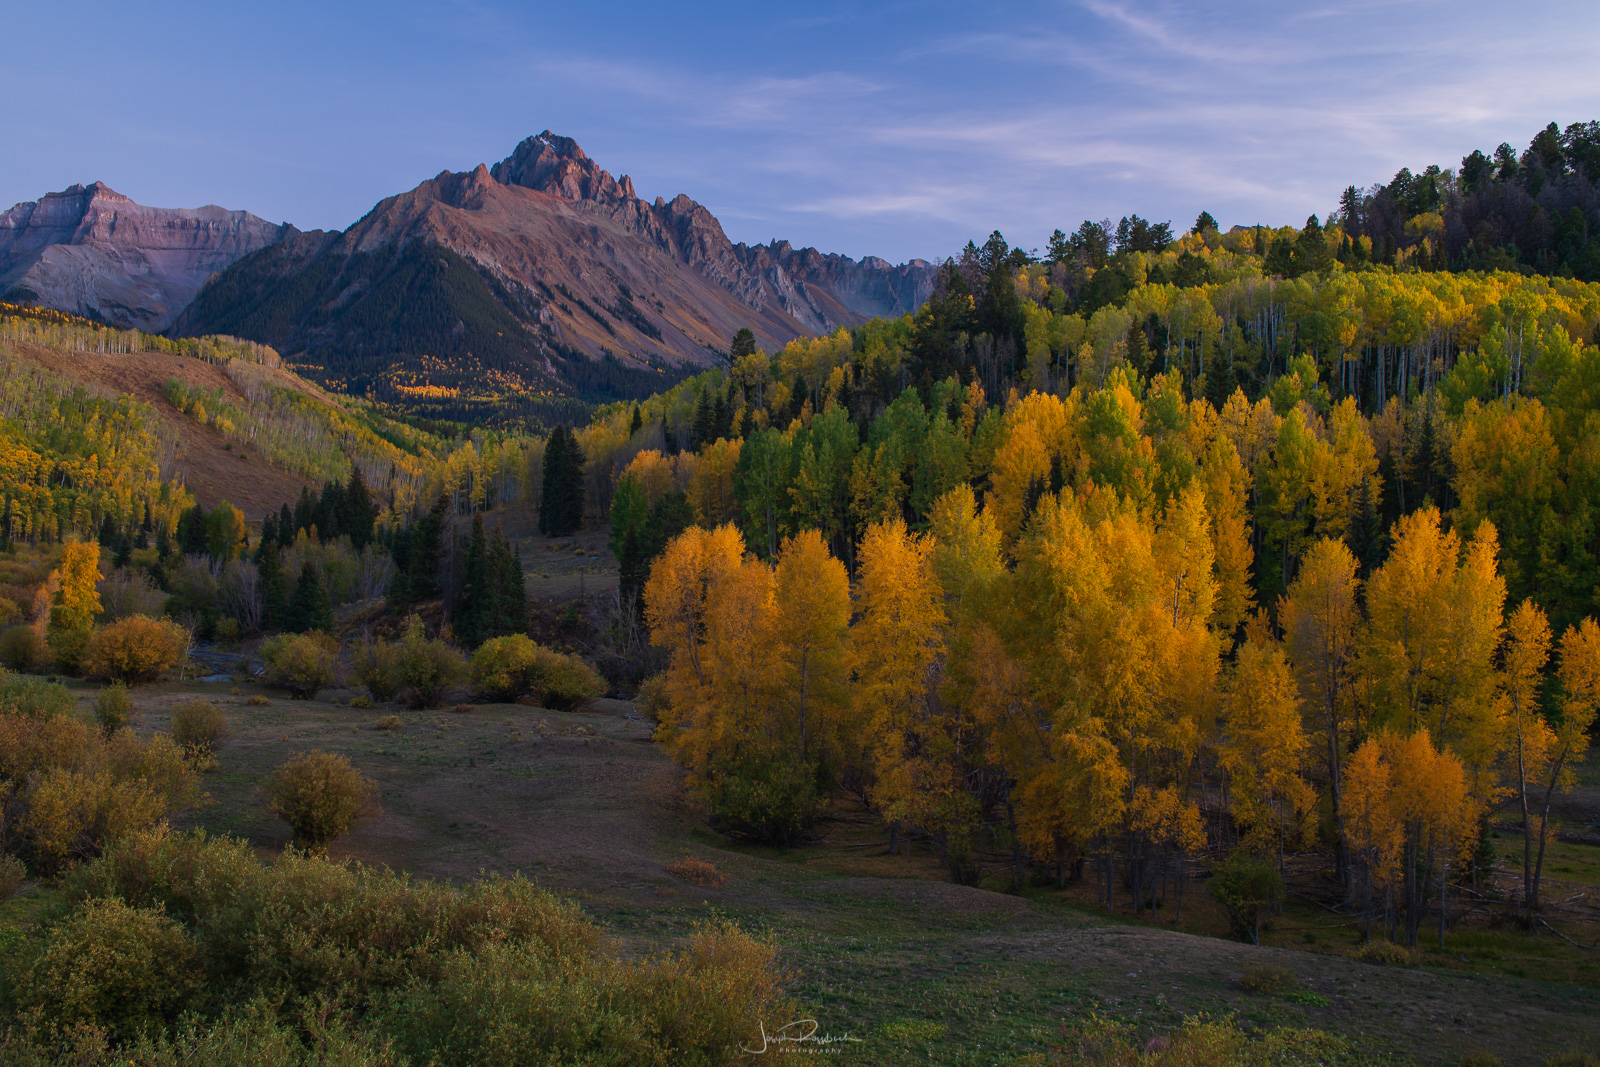 Autumn color below Mount Sneffels at twilight.